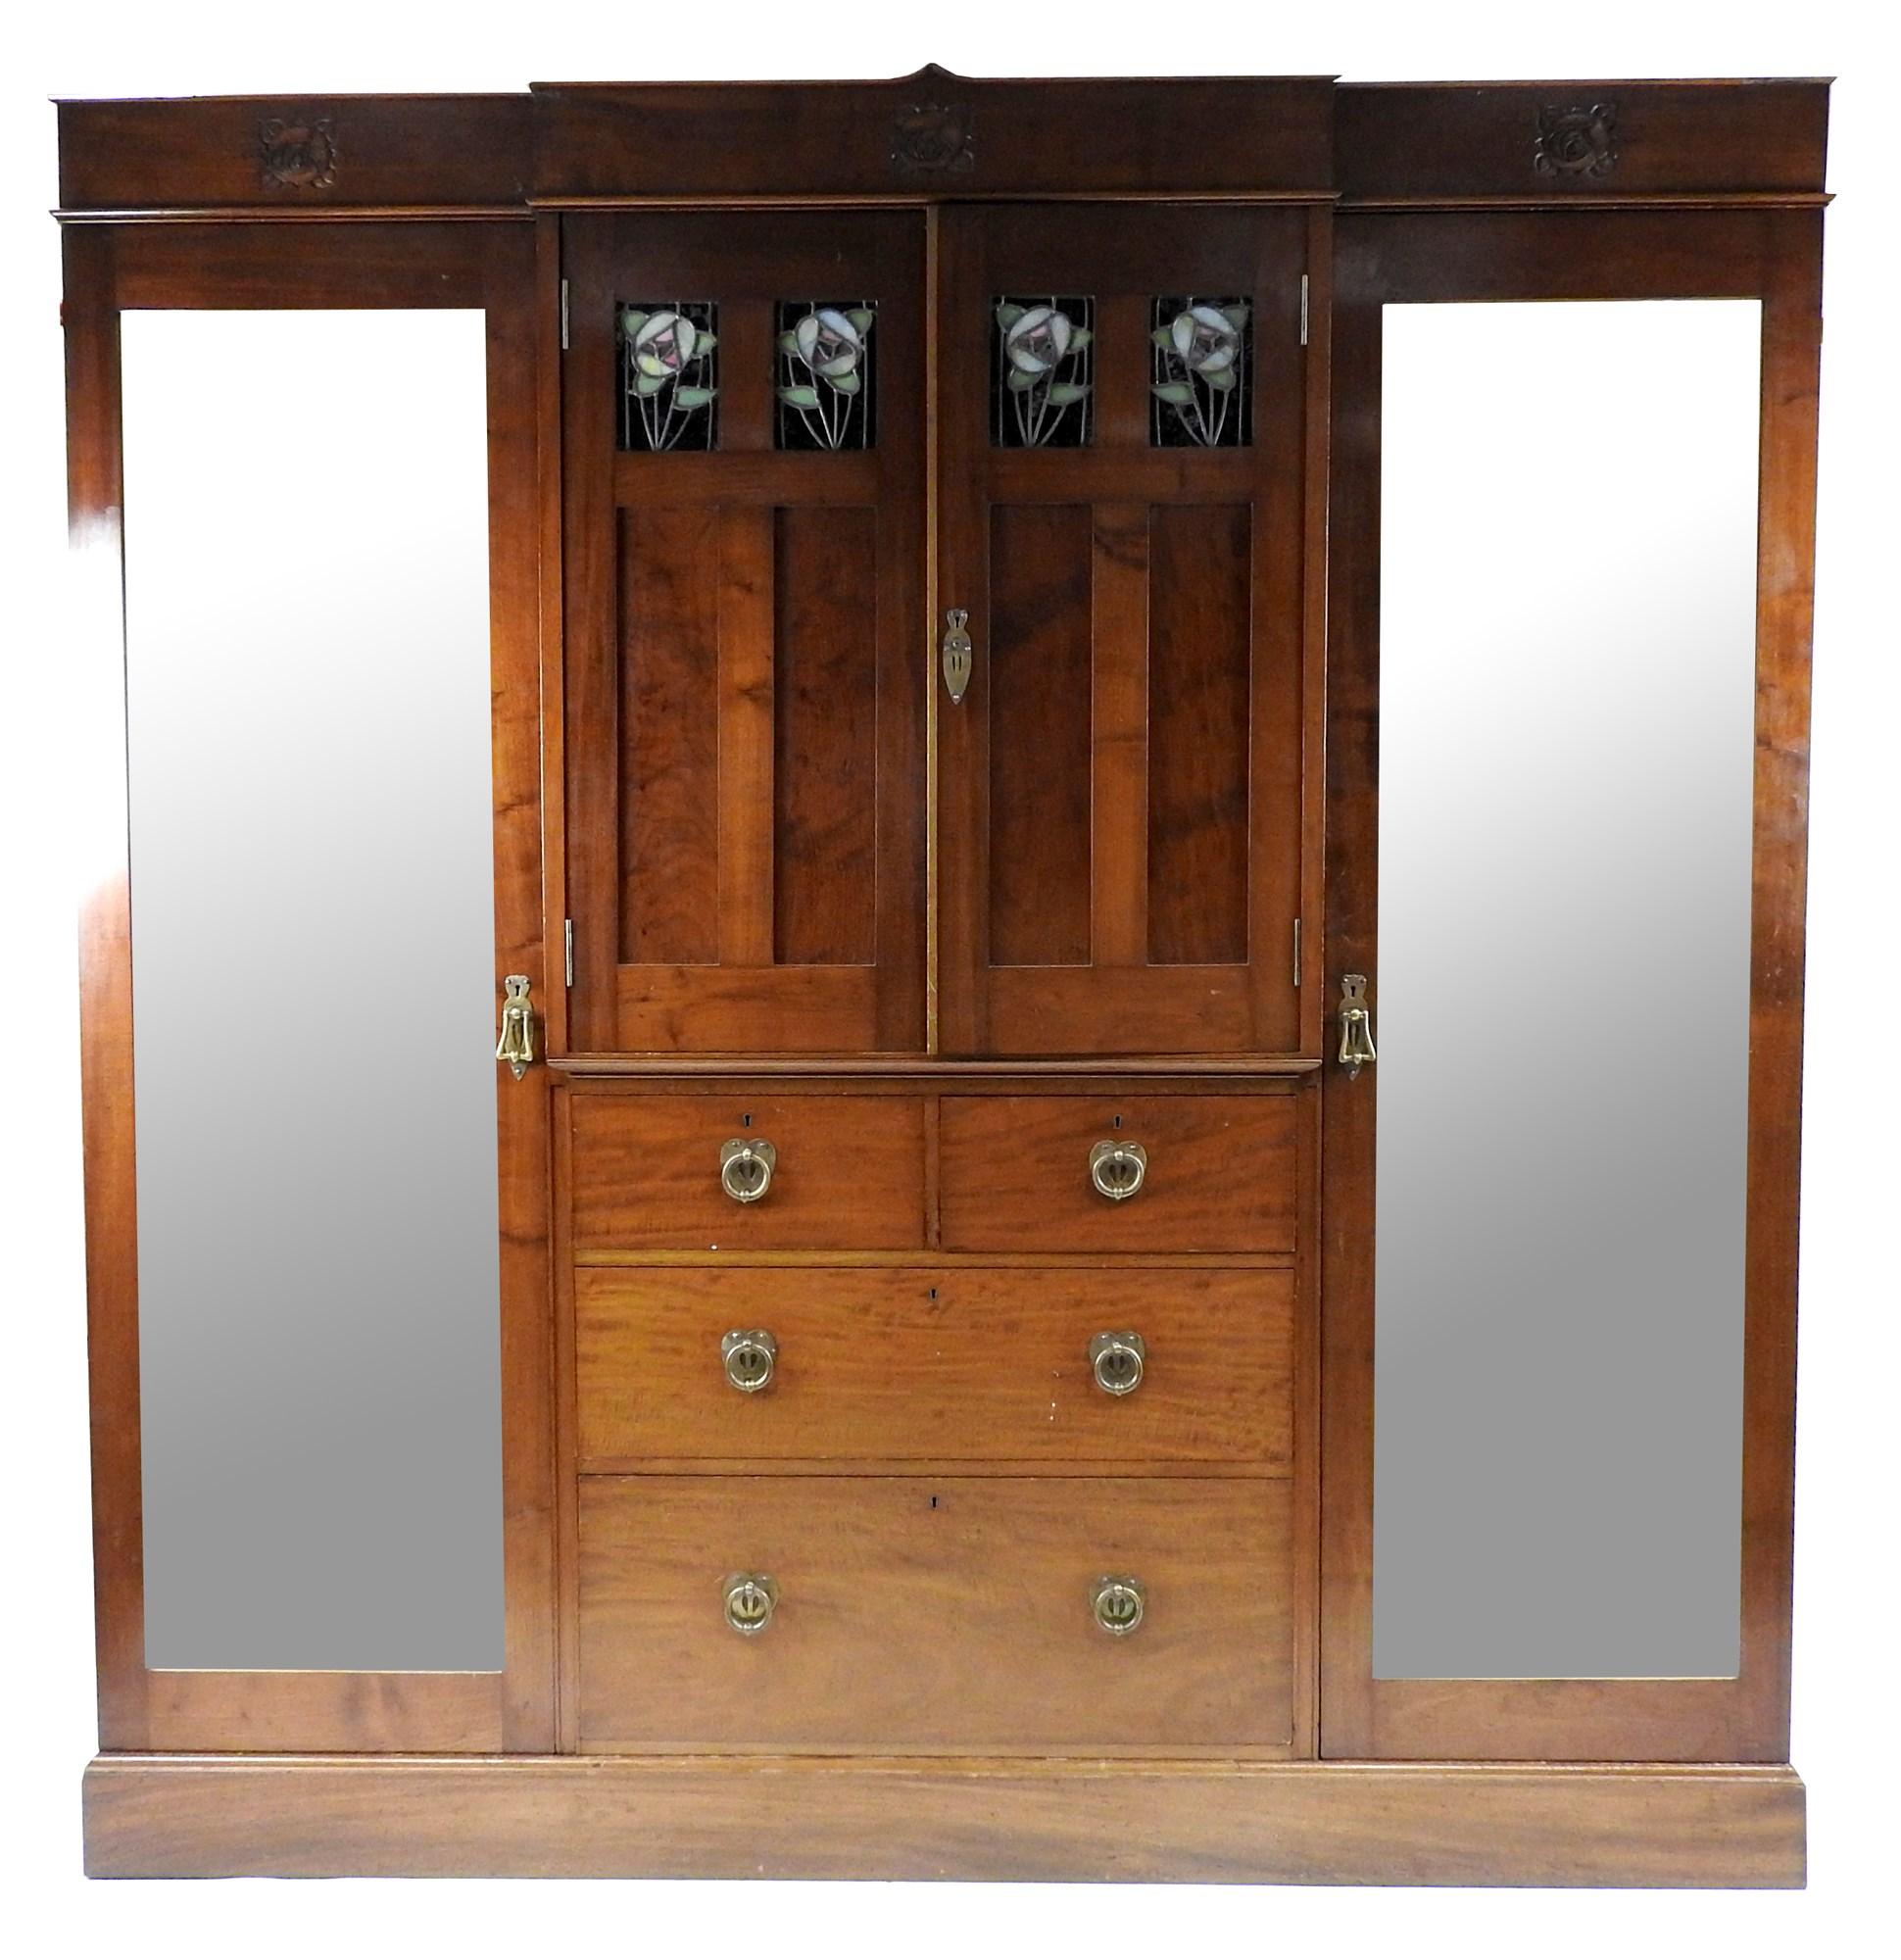 Lot 167 - A Glasgow School Arts and Crafts mahogany bedroom suite